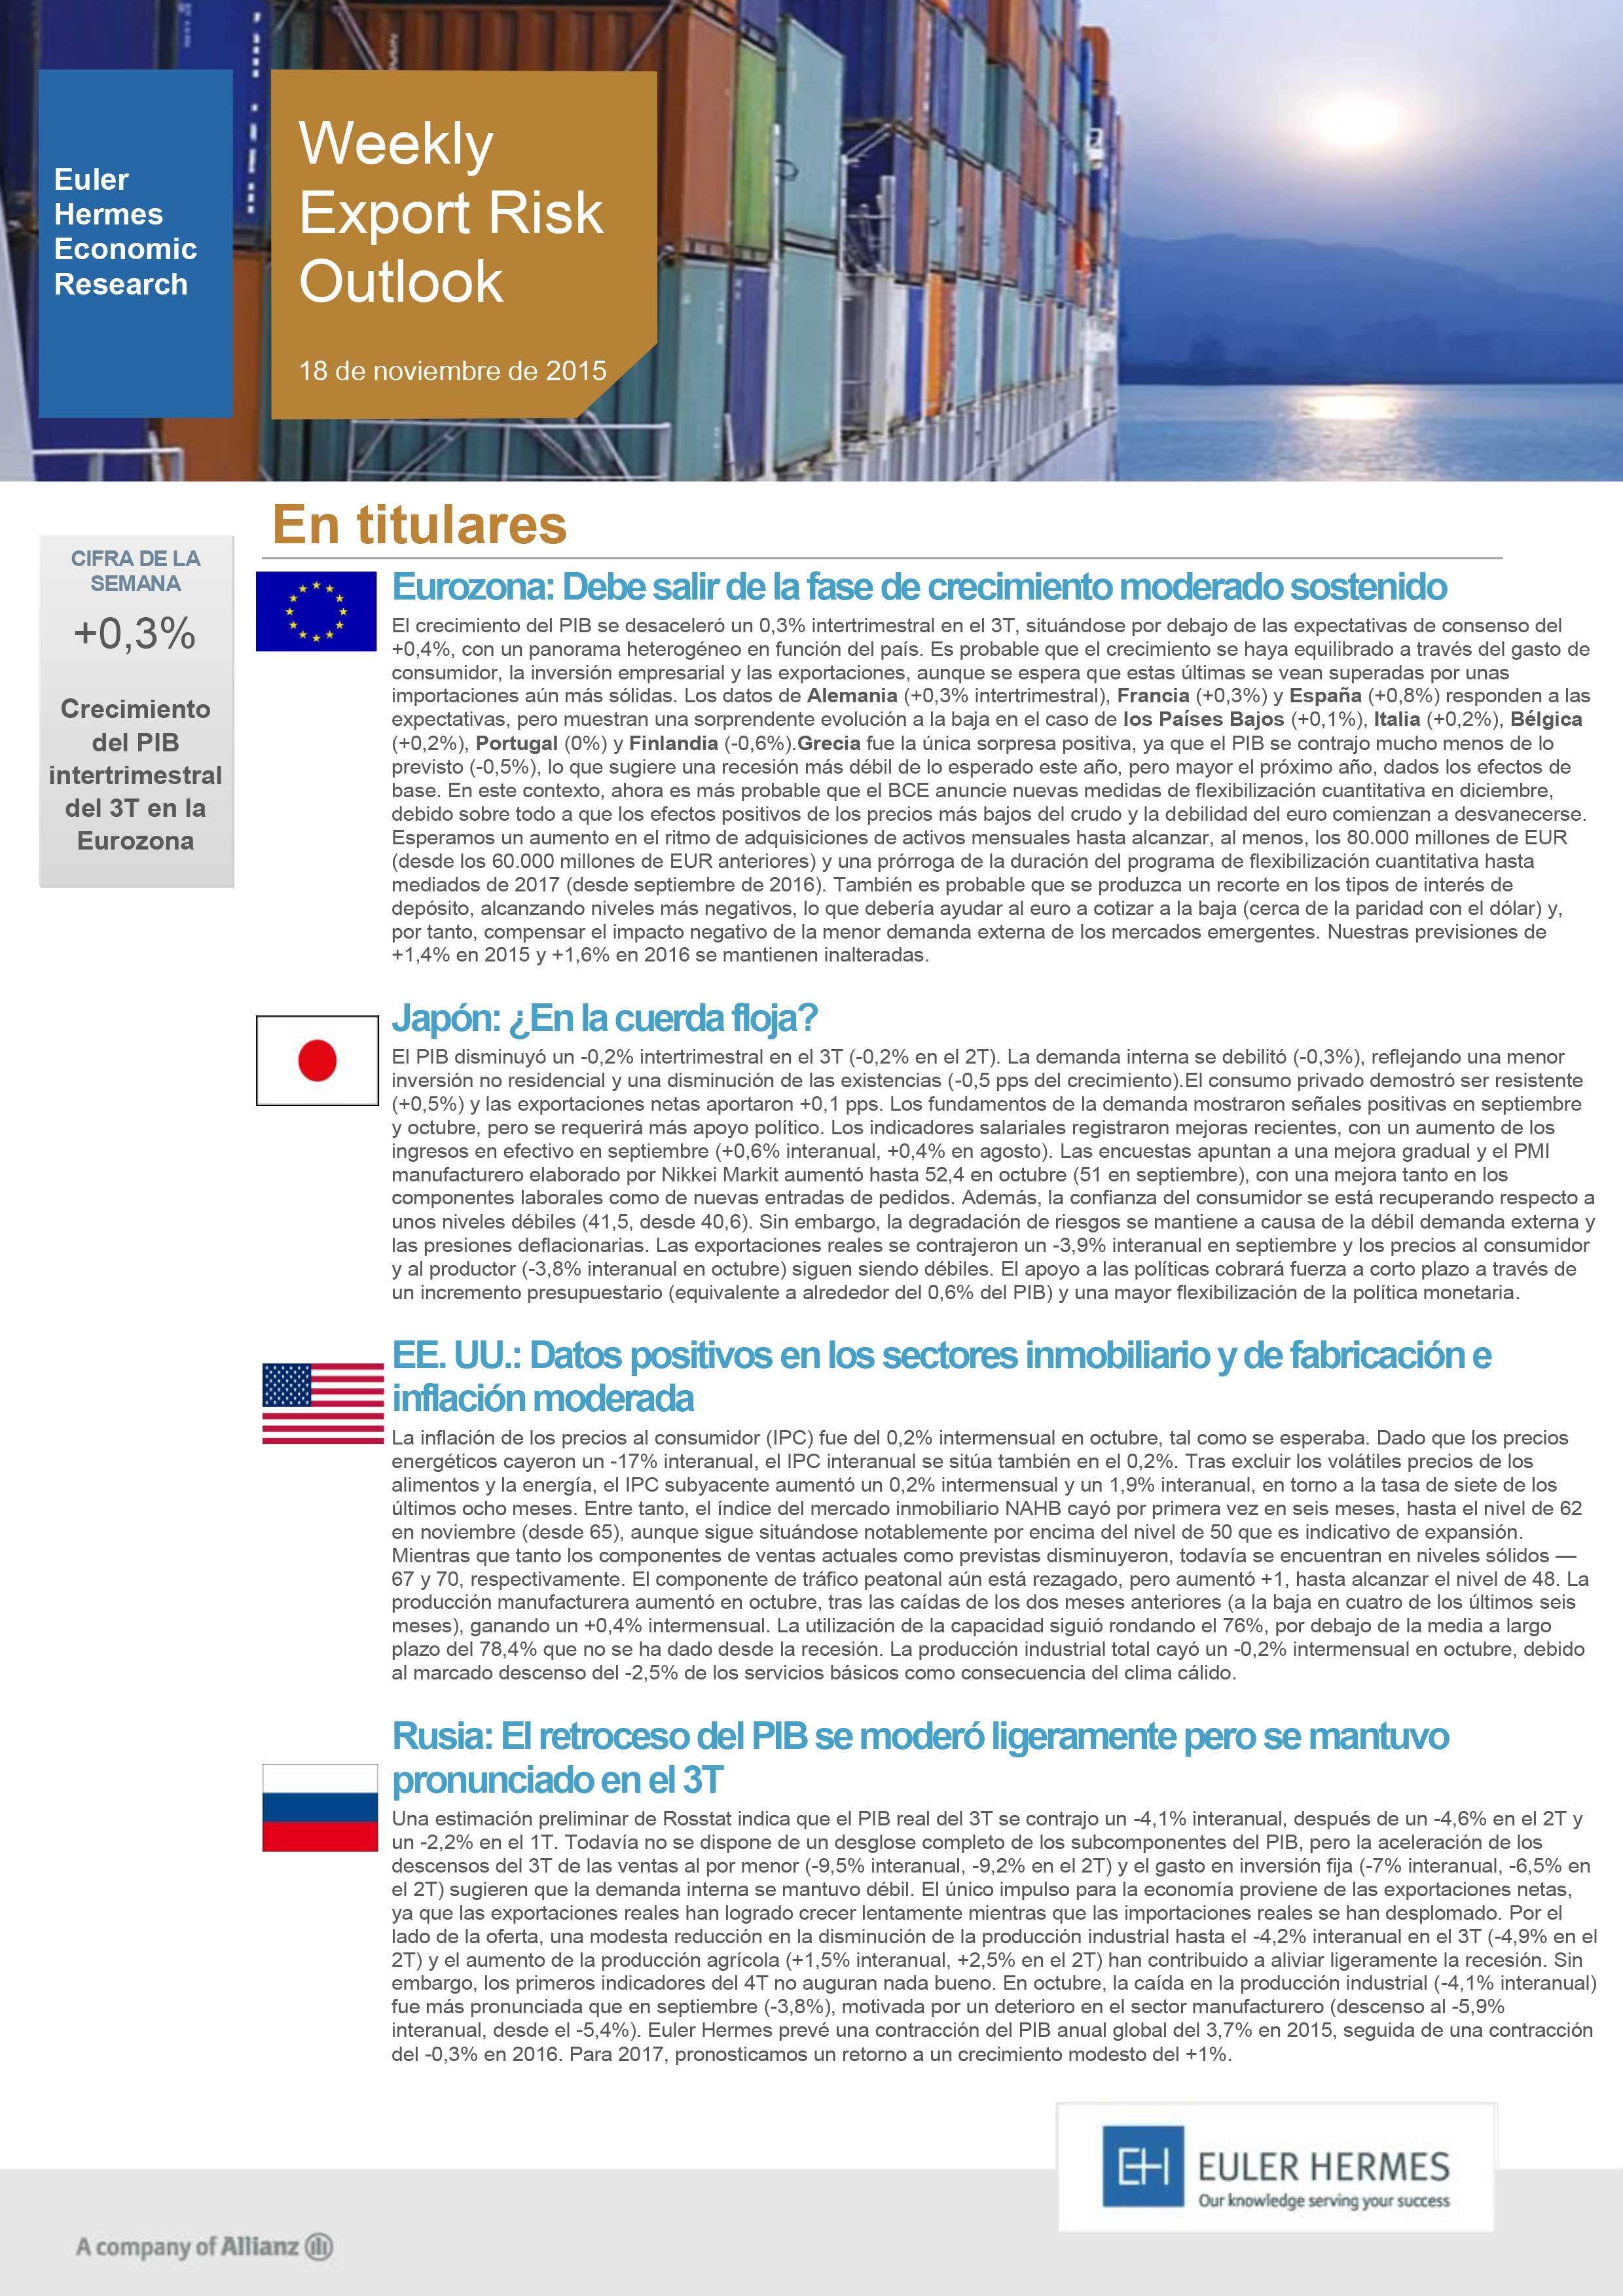 Weekly-Export-Risk-Outlook-No-44-(18-November-2015)-ES_rev-1